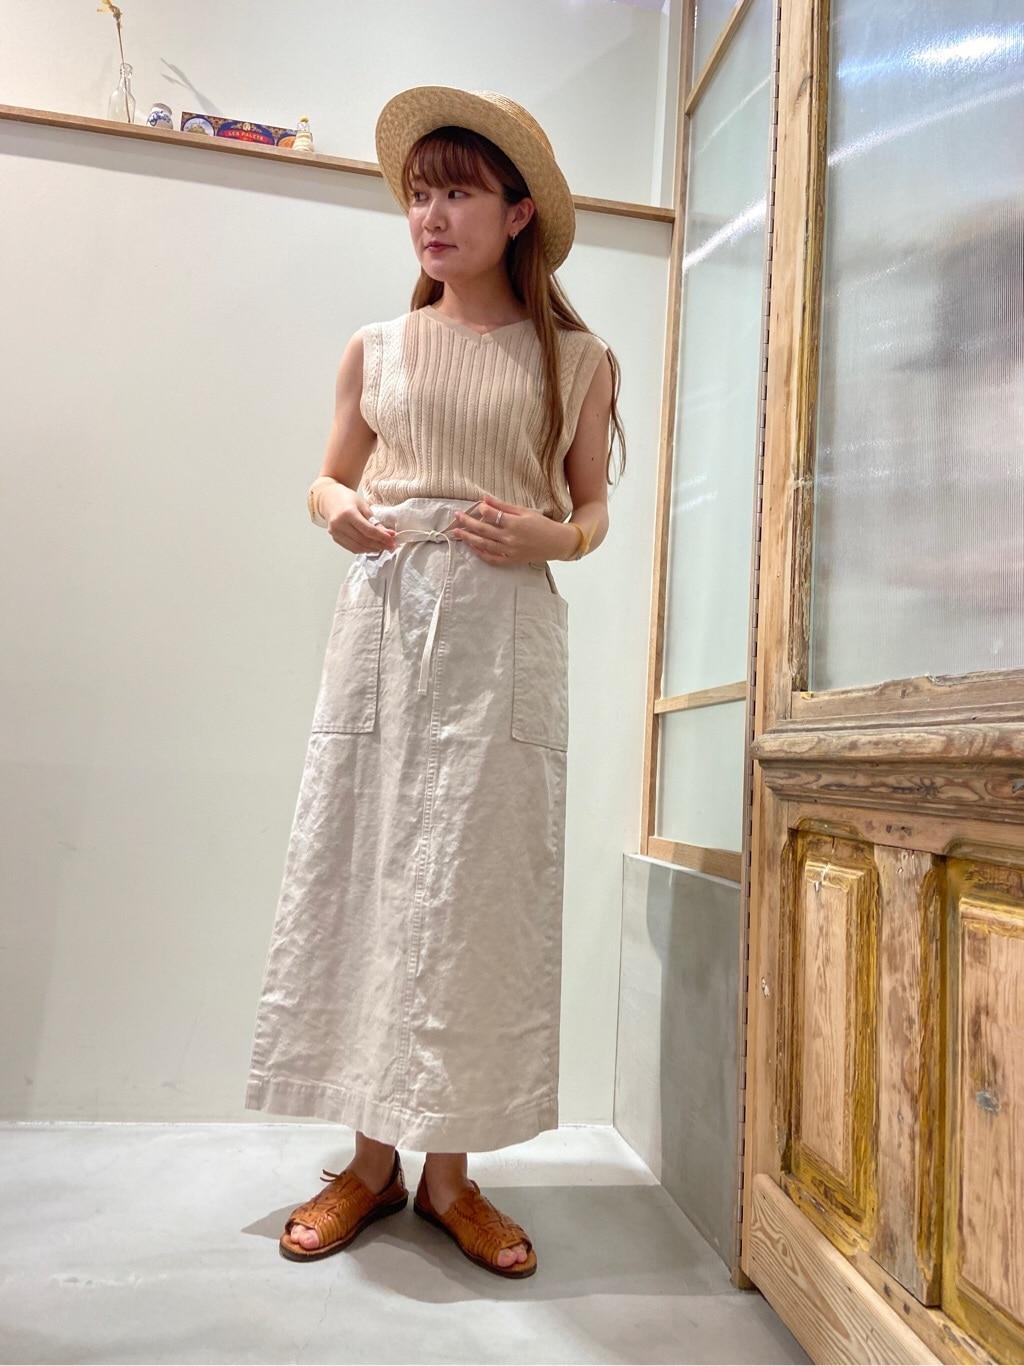 bulle de savon 渋谷スクランブルスクエア 身長:160cm 2020.07.13